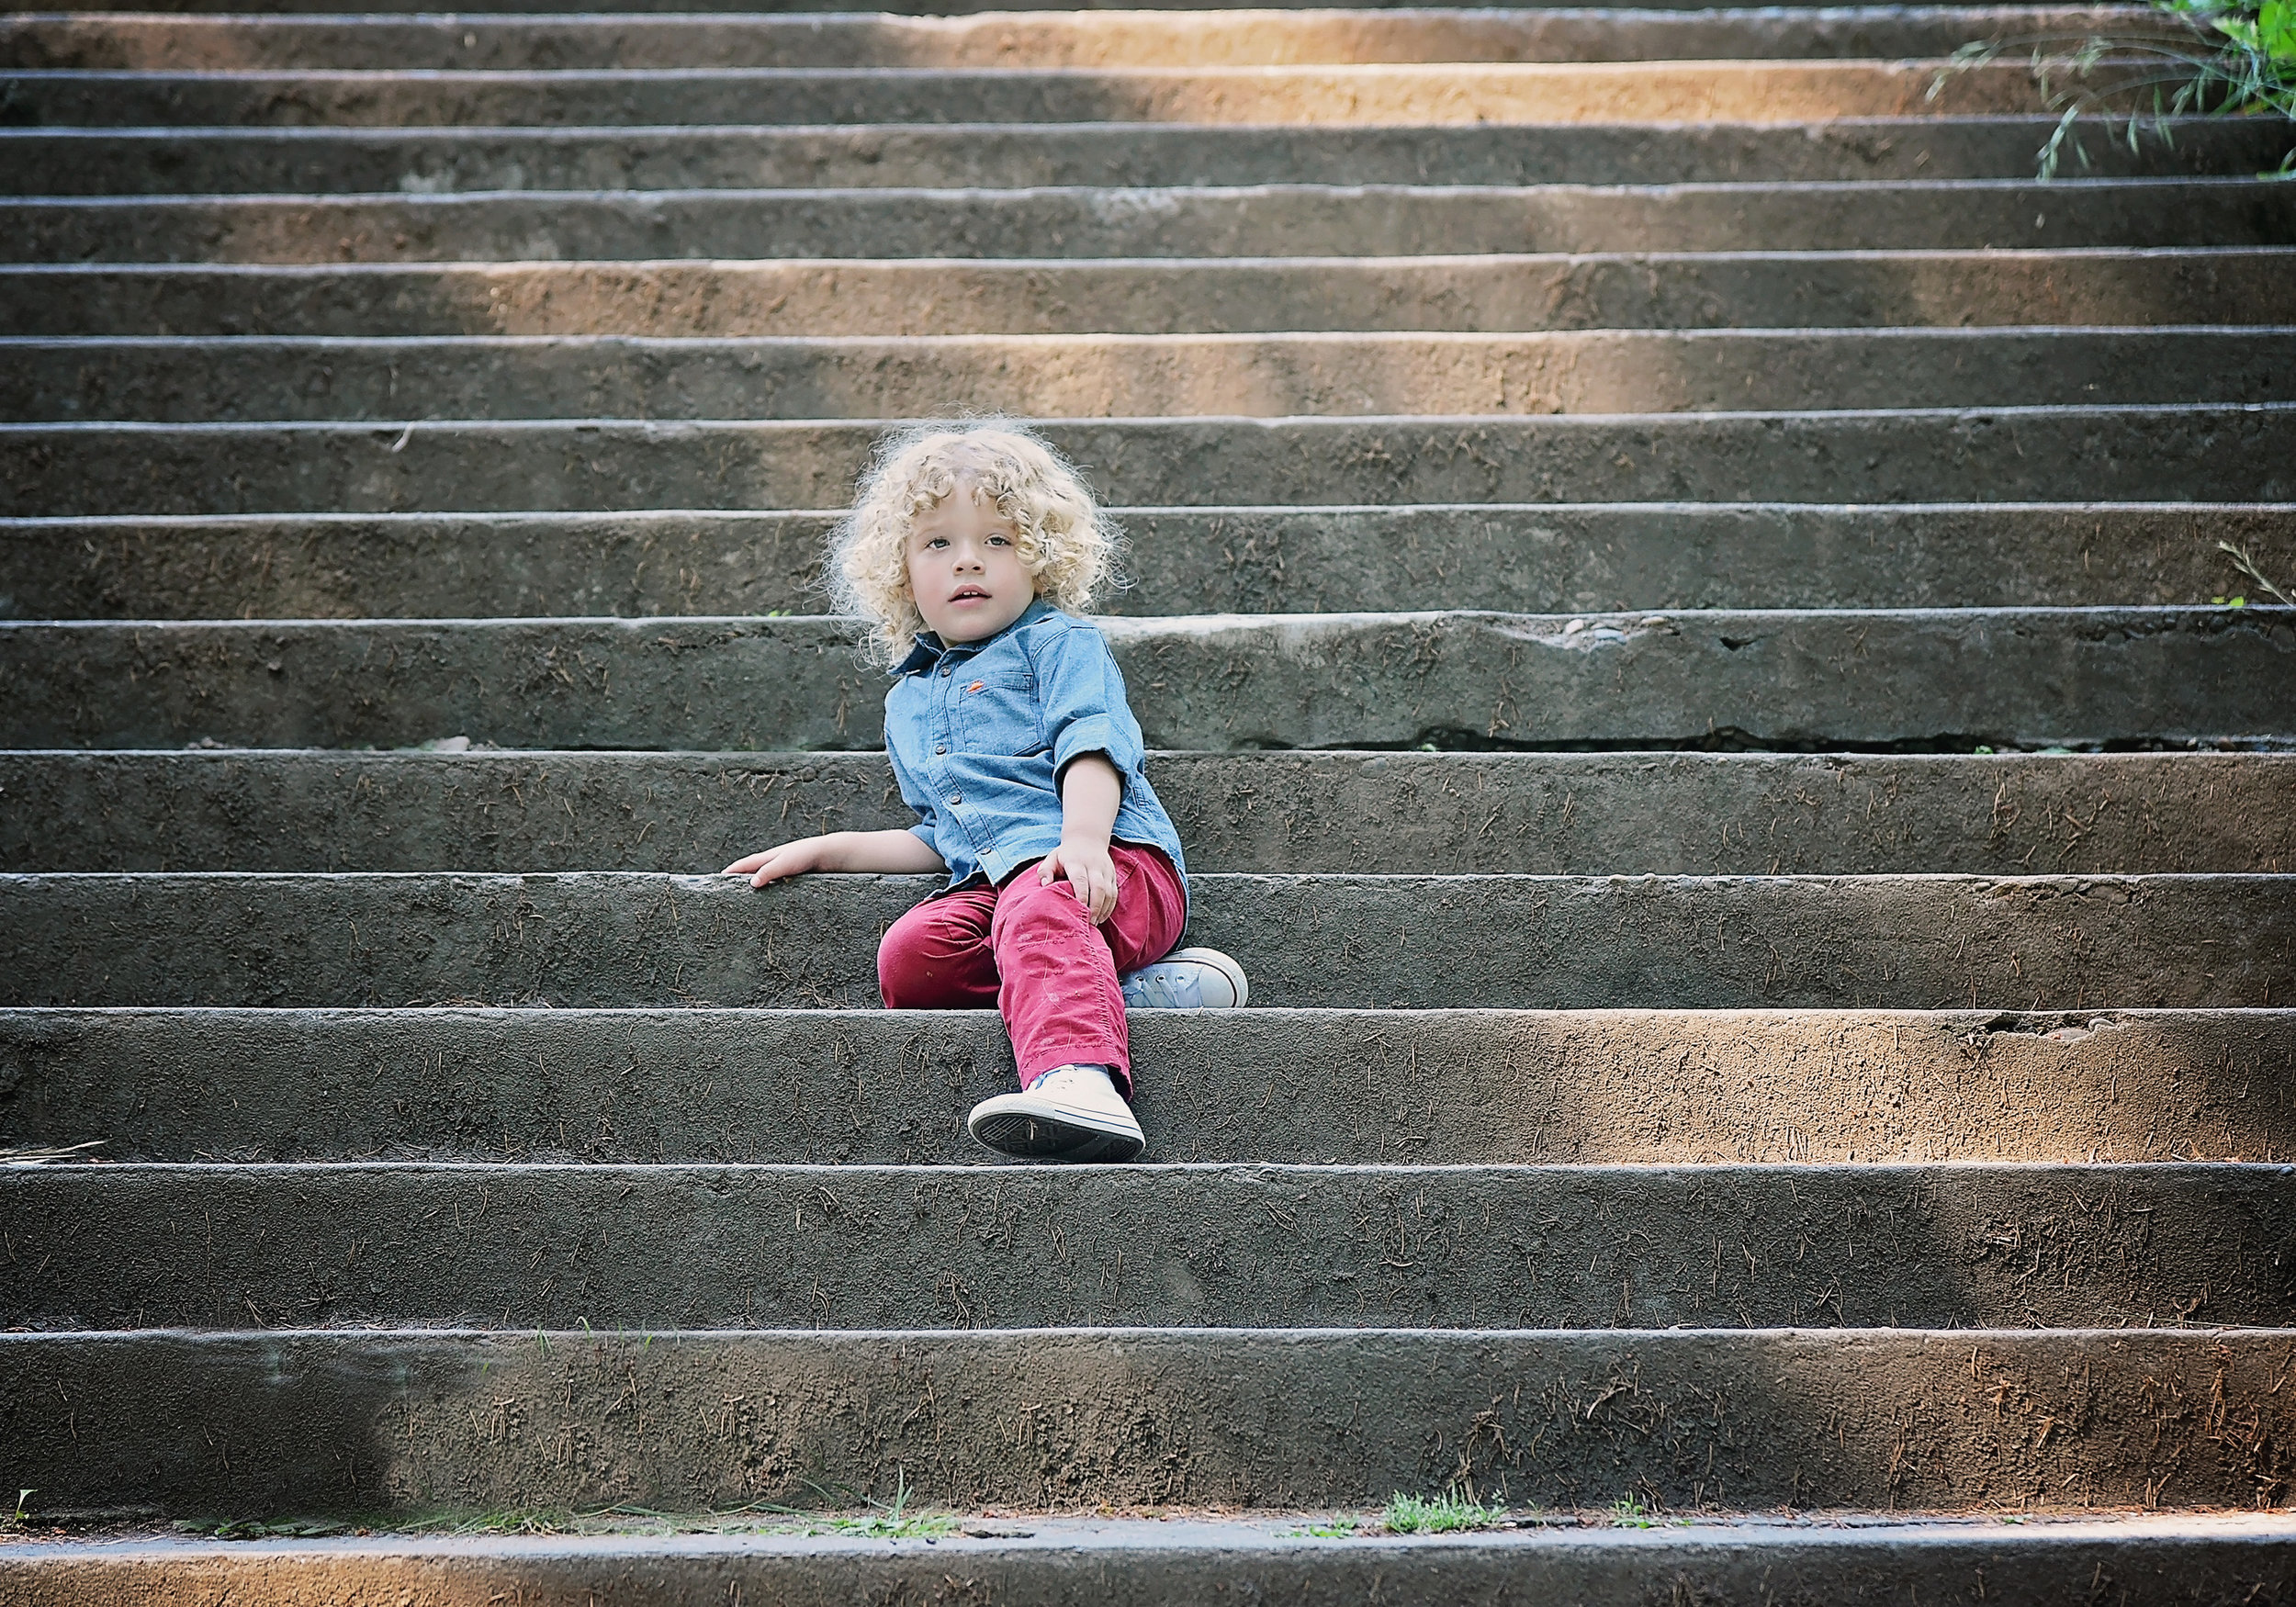 Child Portraits | Lifestyle Portrait Photography | Lacey O